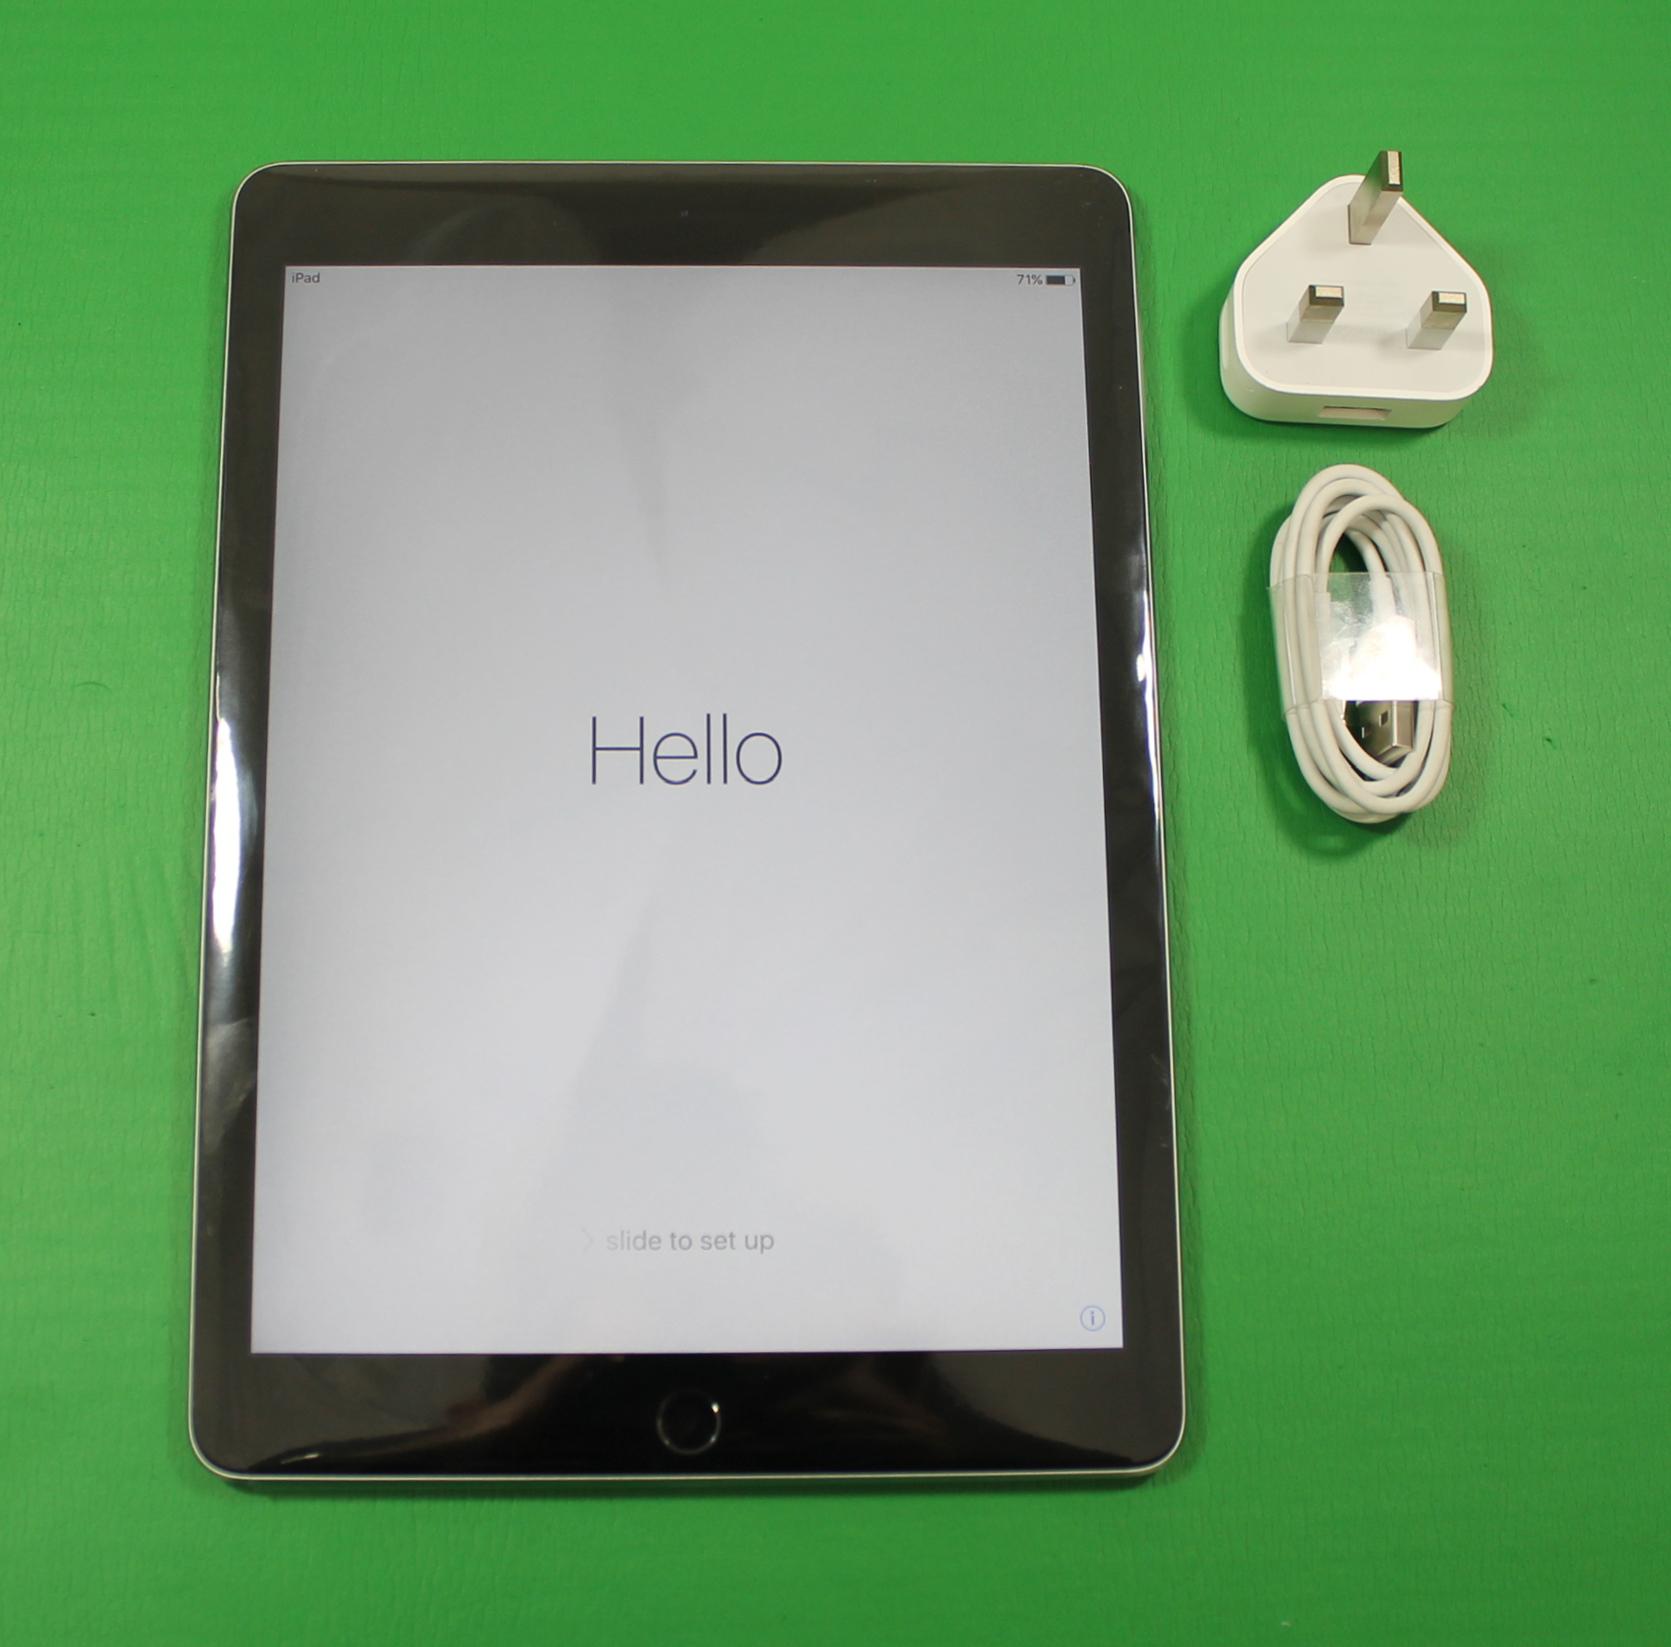 apple ipad air 2 wi fi 16gb space grey new ebay. Black Bedroom Furniture Sets. Home Design Ideas